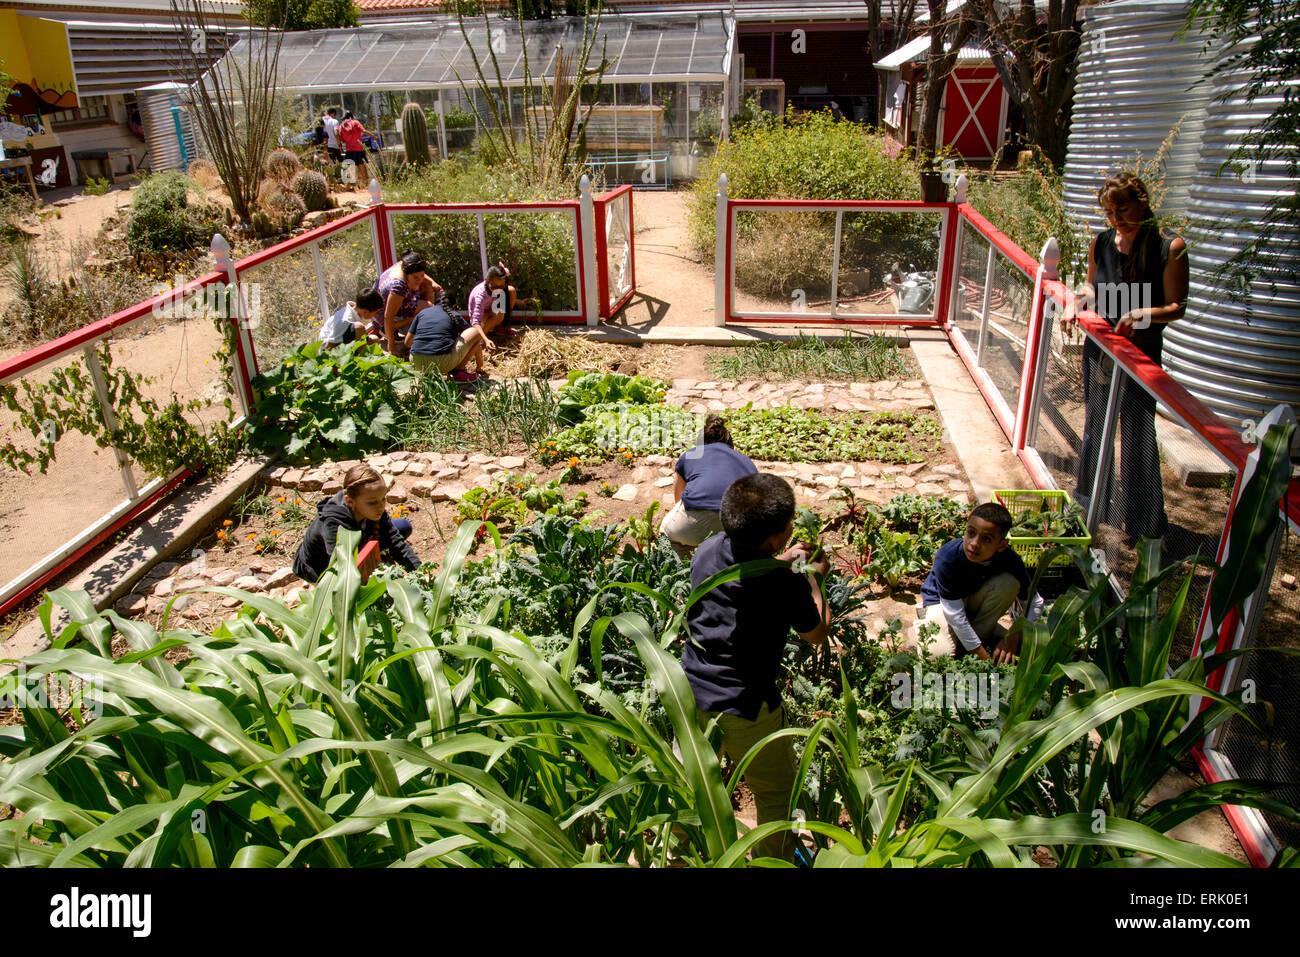 Manzo Elementary School Students Work In The Schoolu0027s Organic Garden, Tucson,  Arizona, USA